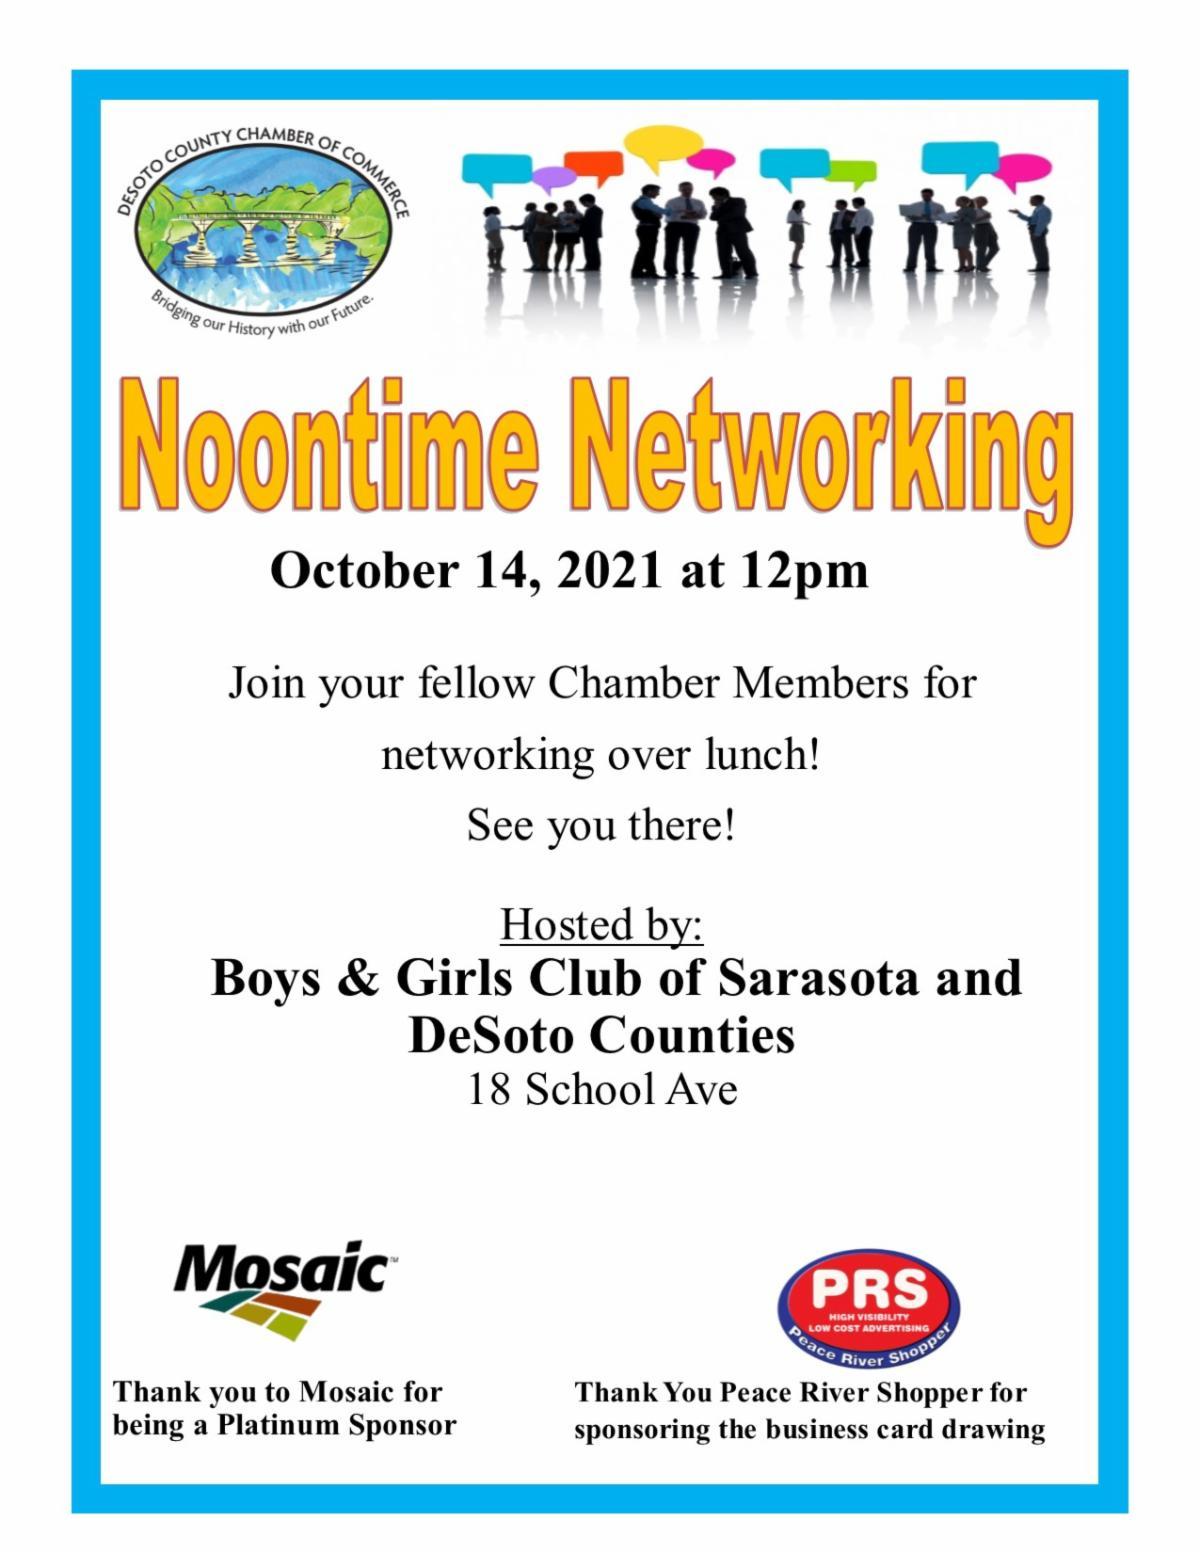 Noontime Networking October 2021